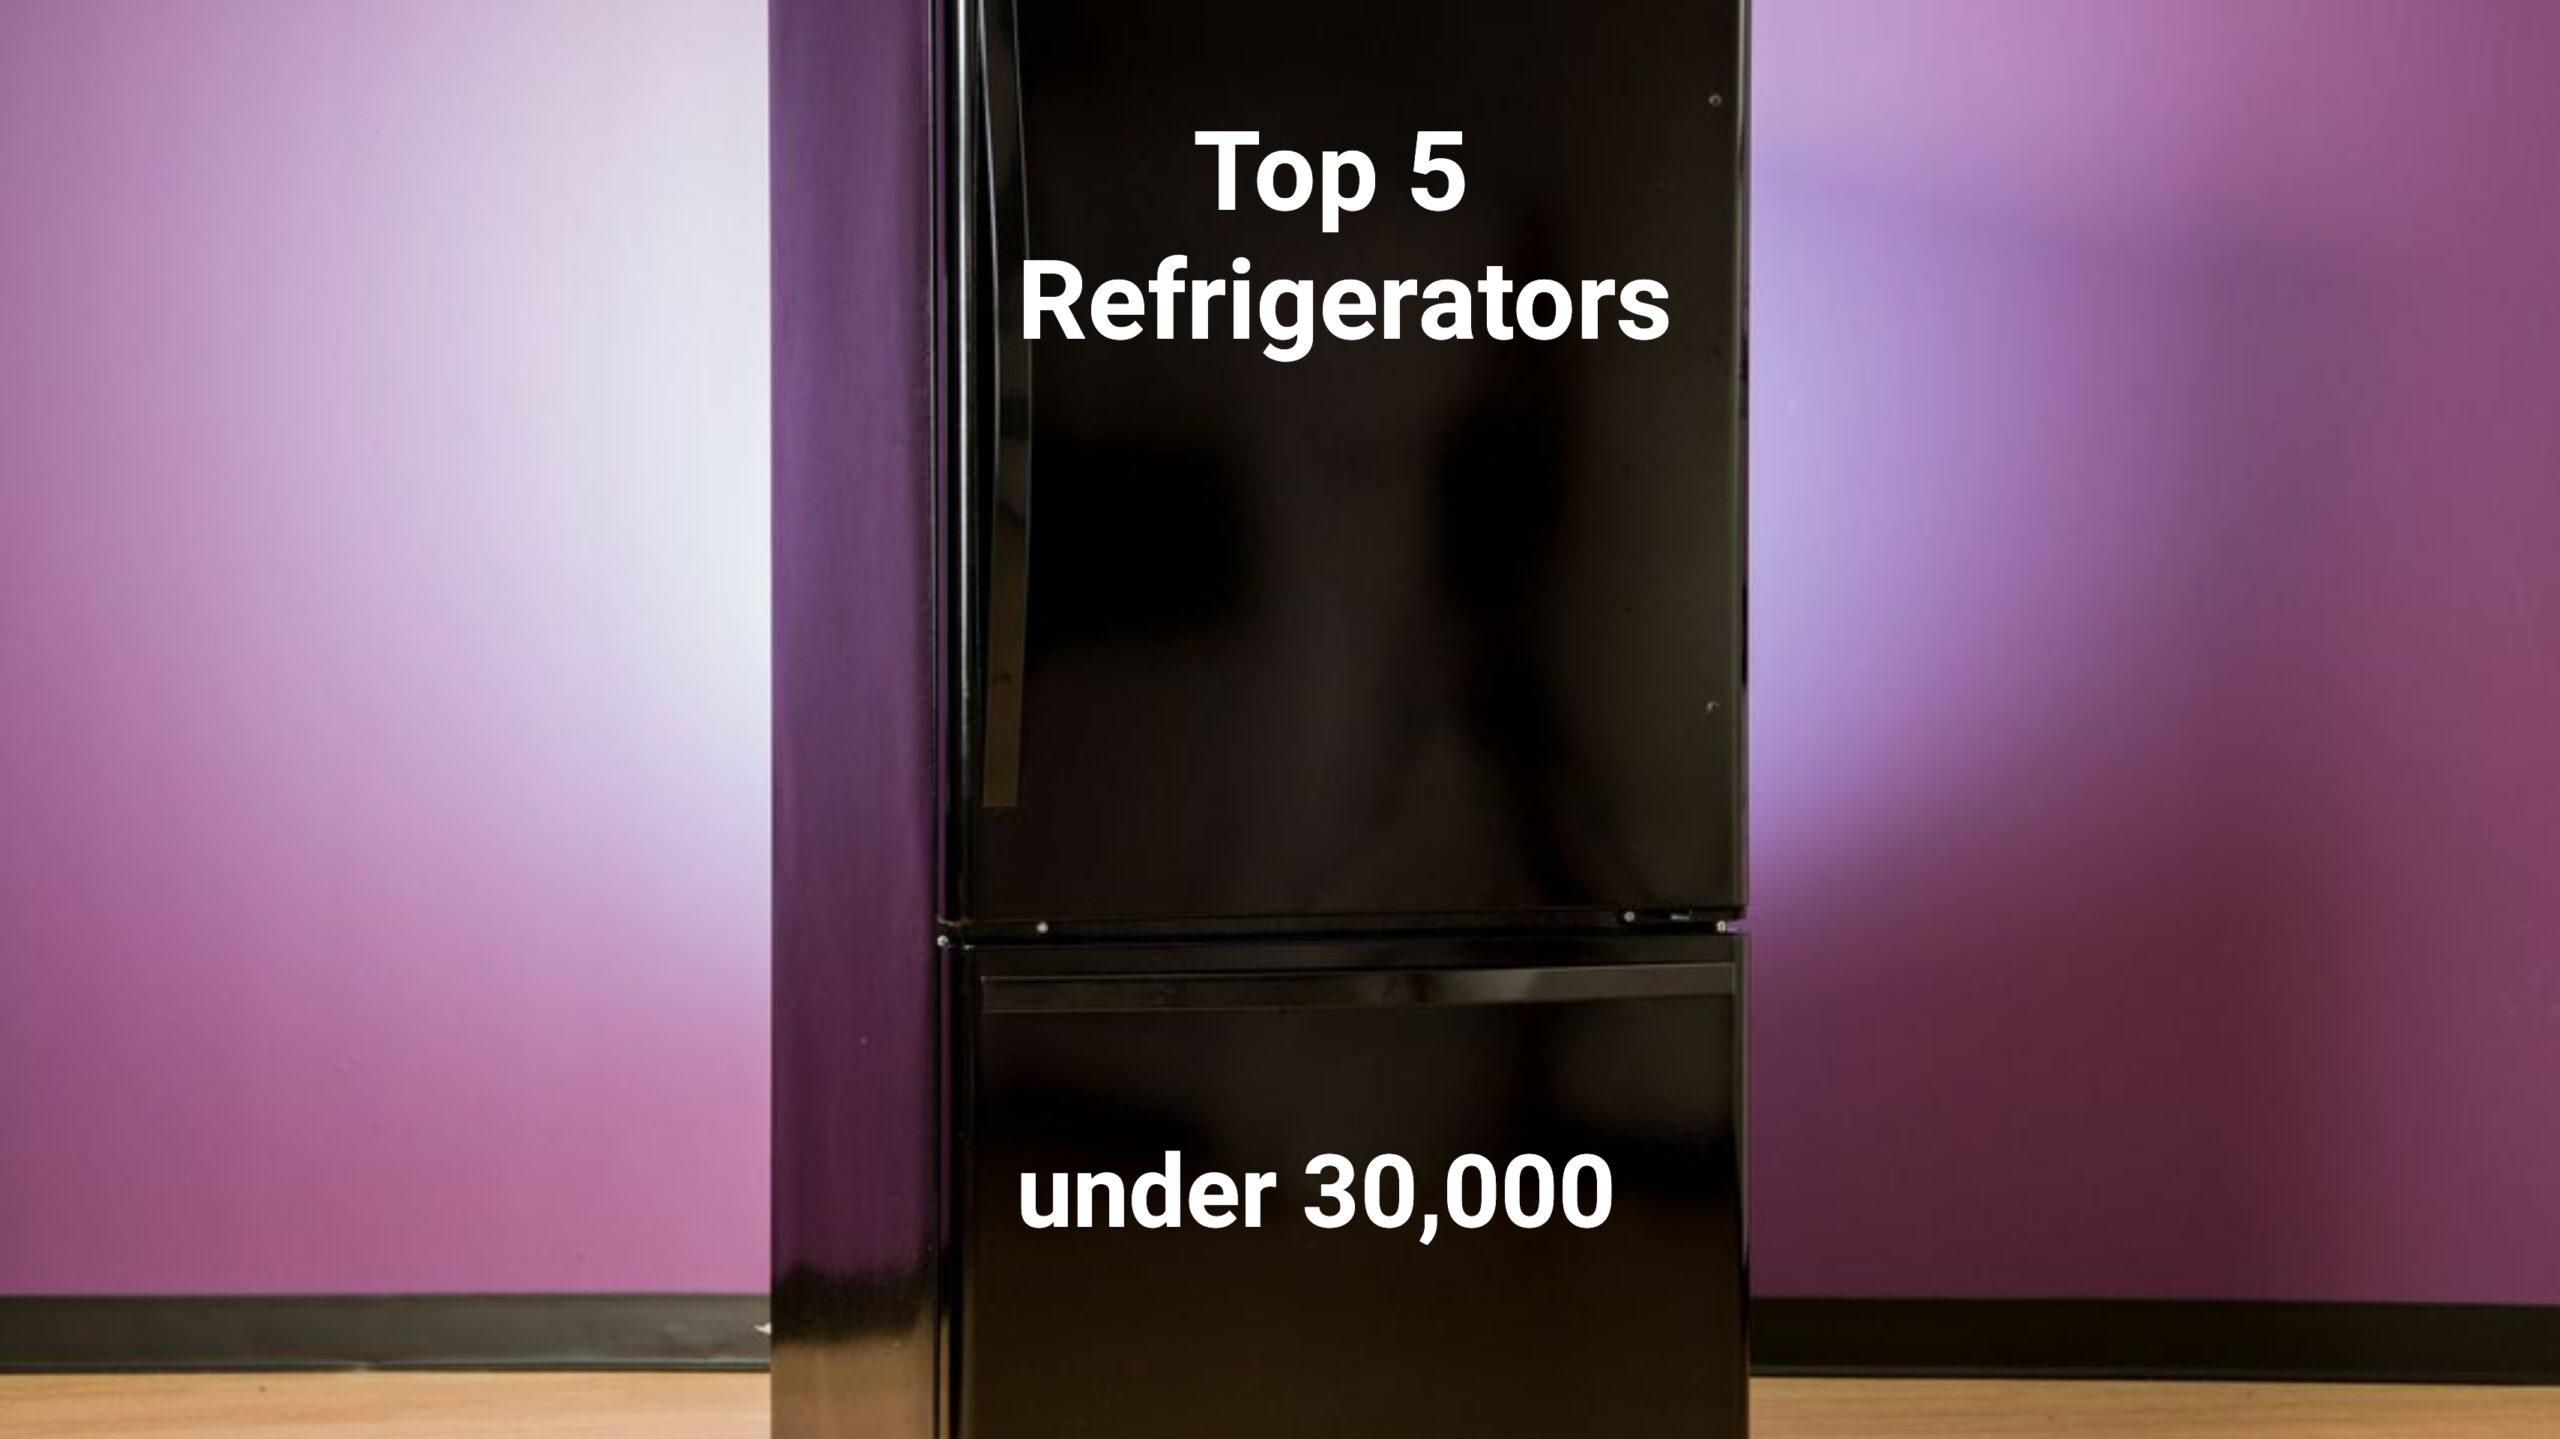 Top 5 Refrigerators under Rs 30,000, August 2017